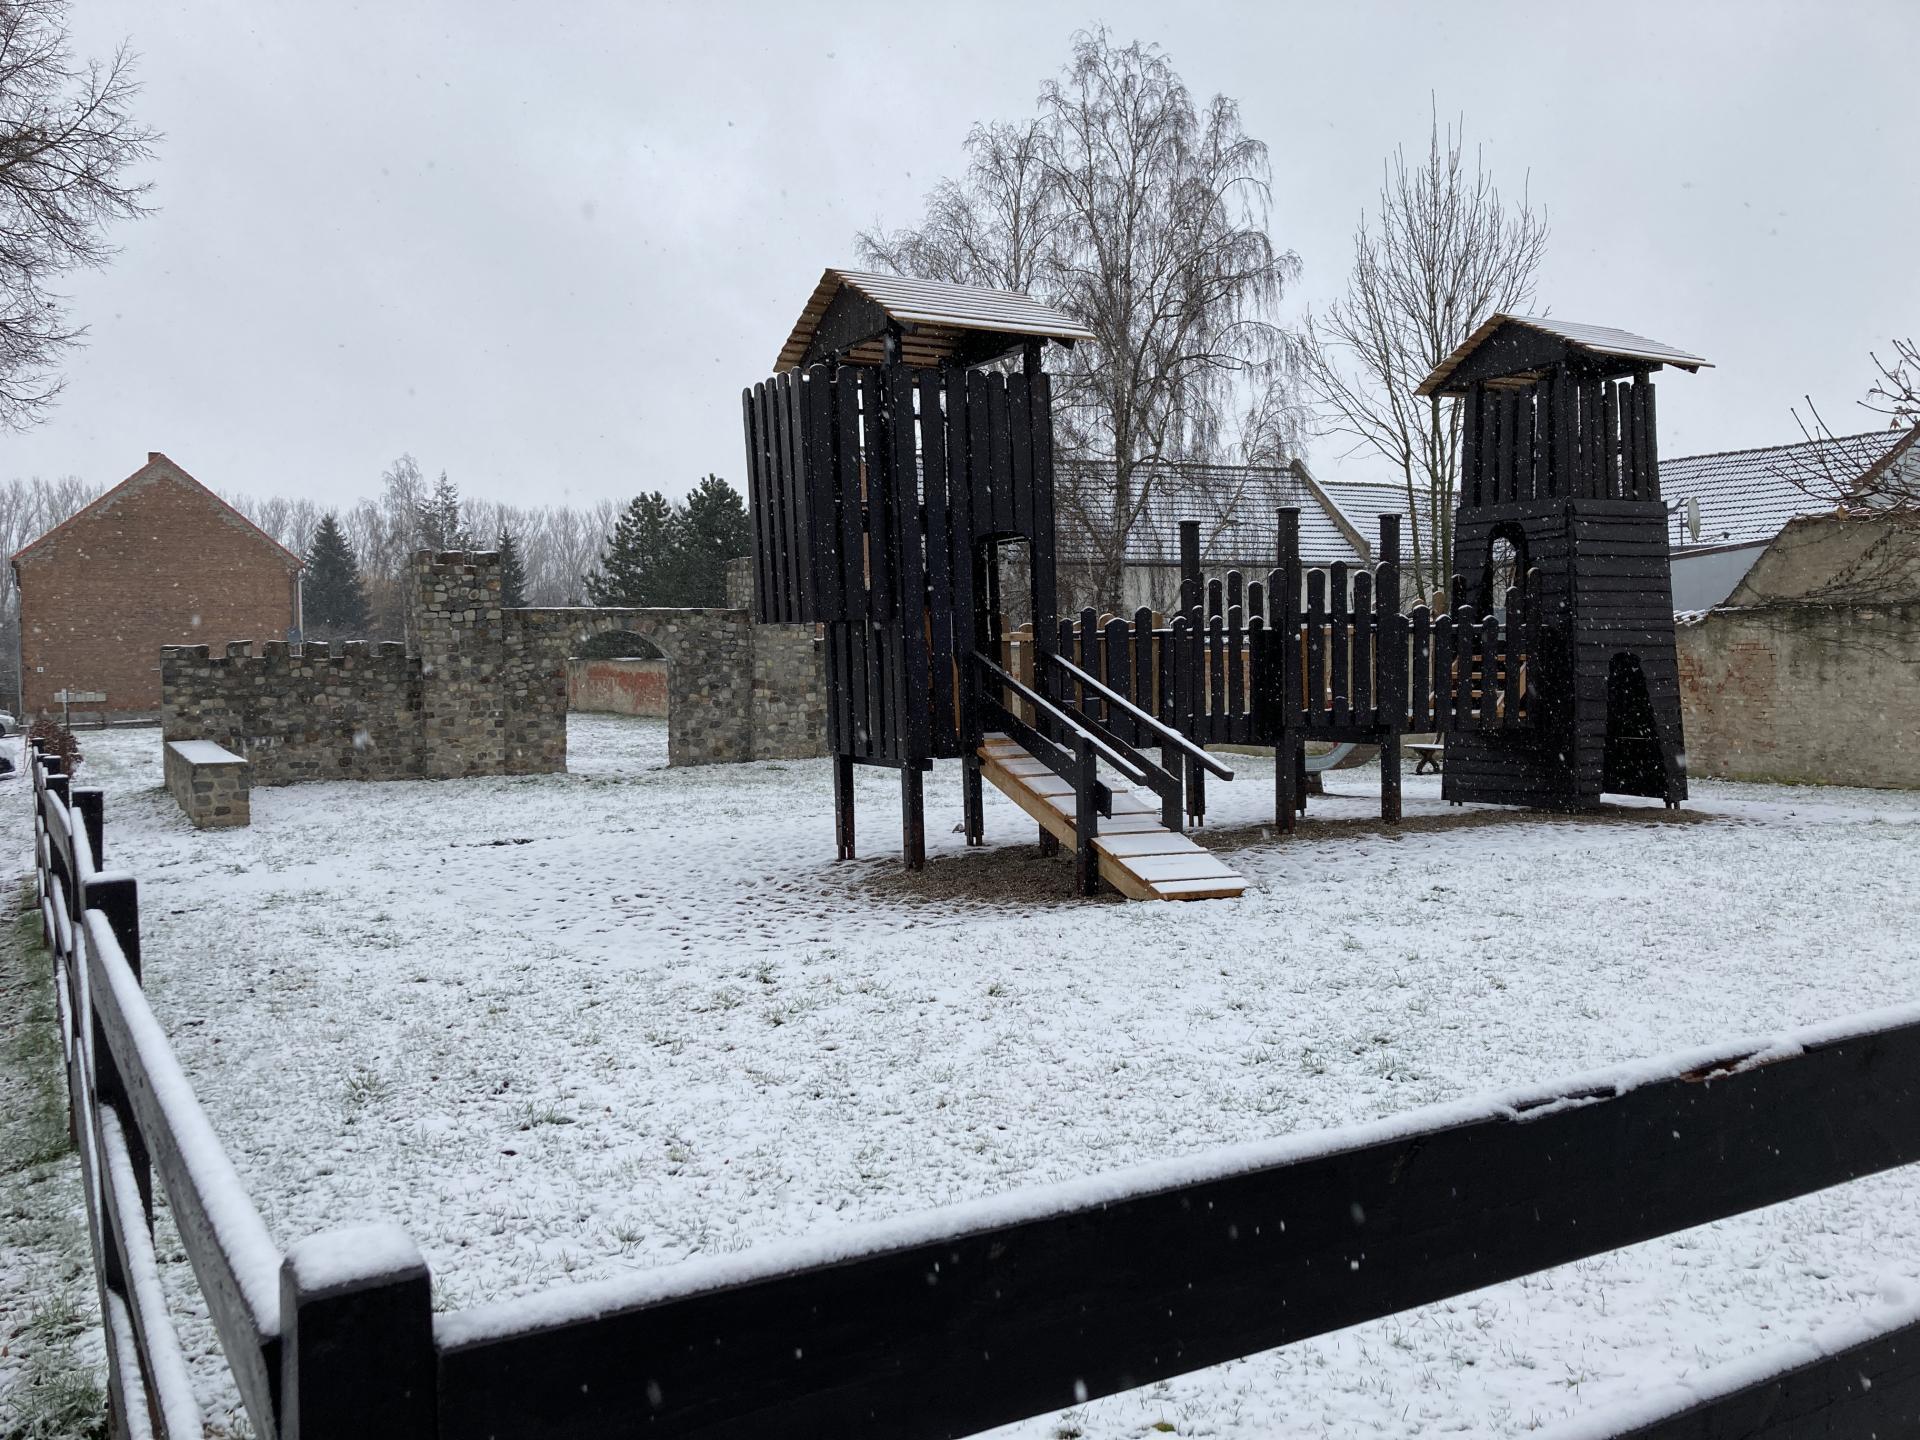 Winterbeginn in Unseburg 2021